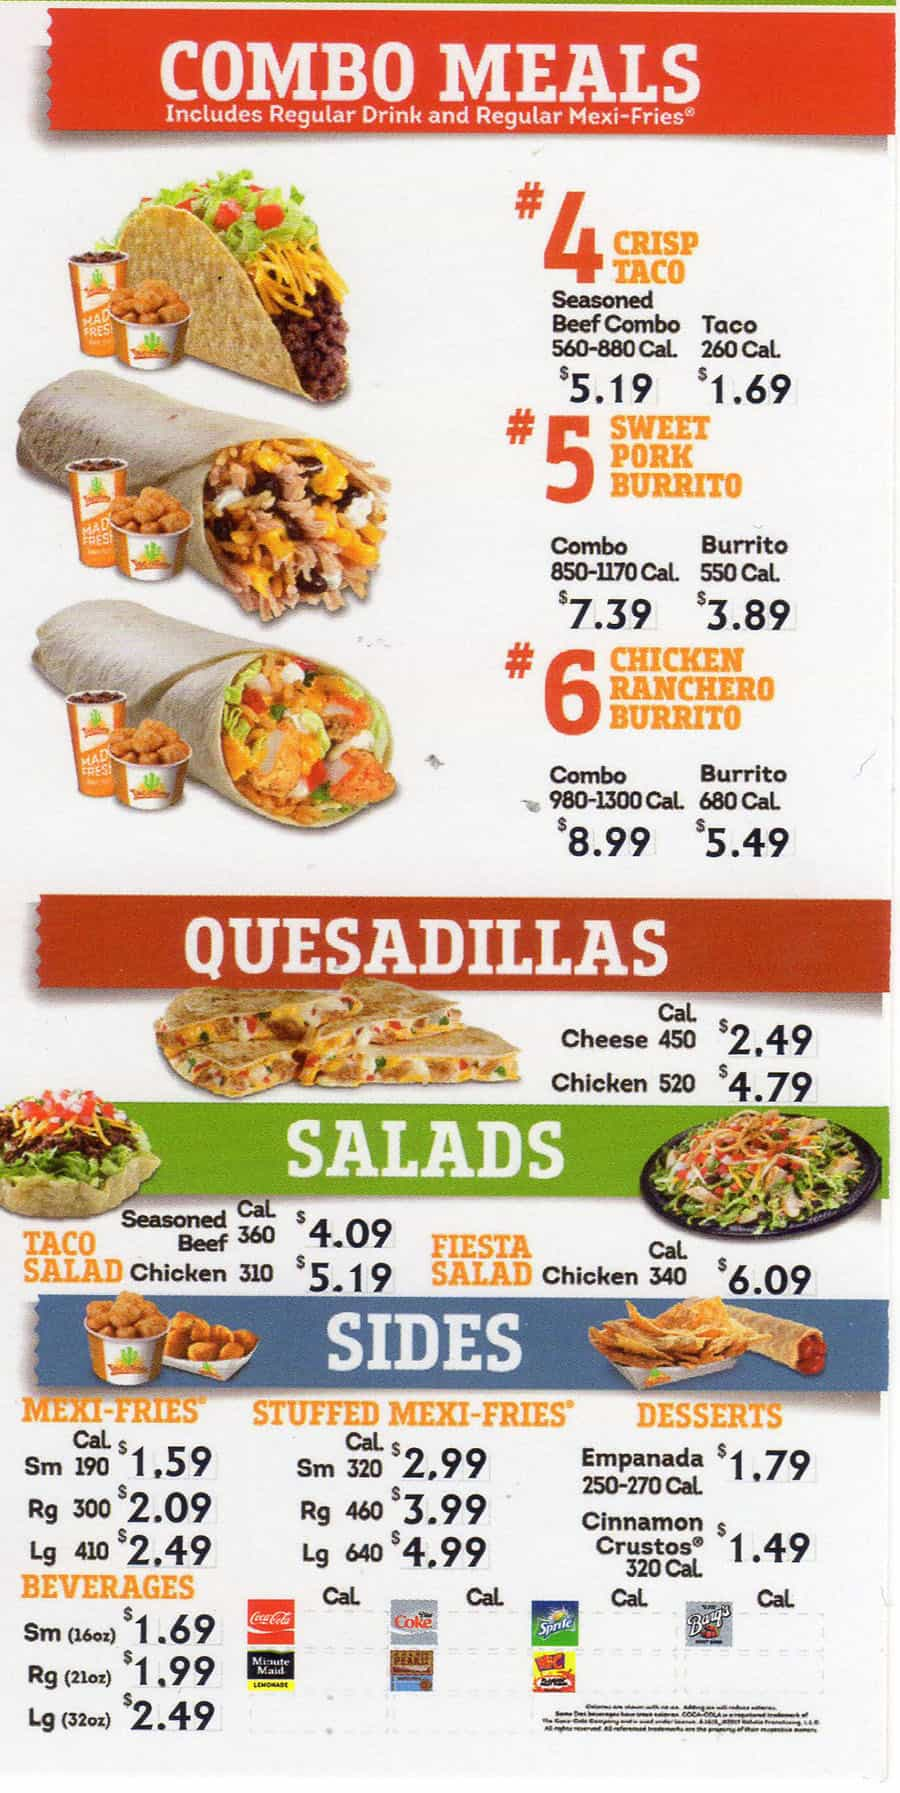 Taco Time menu - combo meals, quesadillas, salads, sides